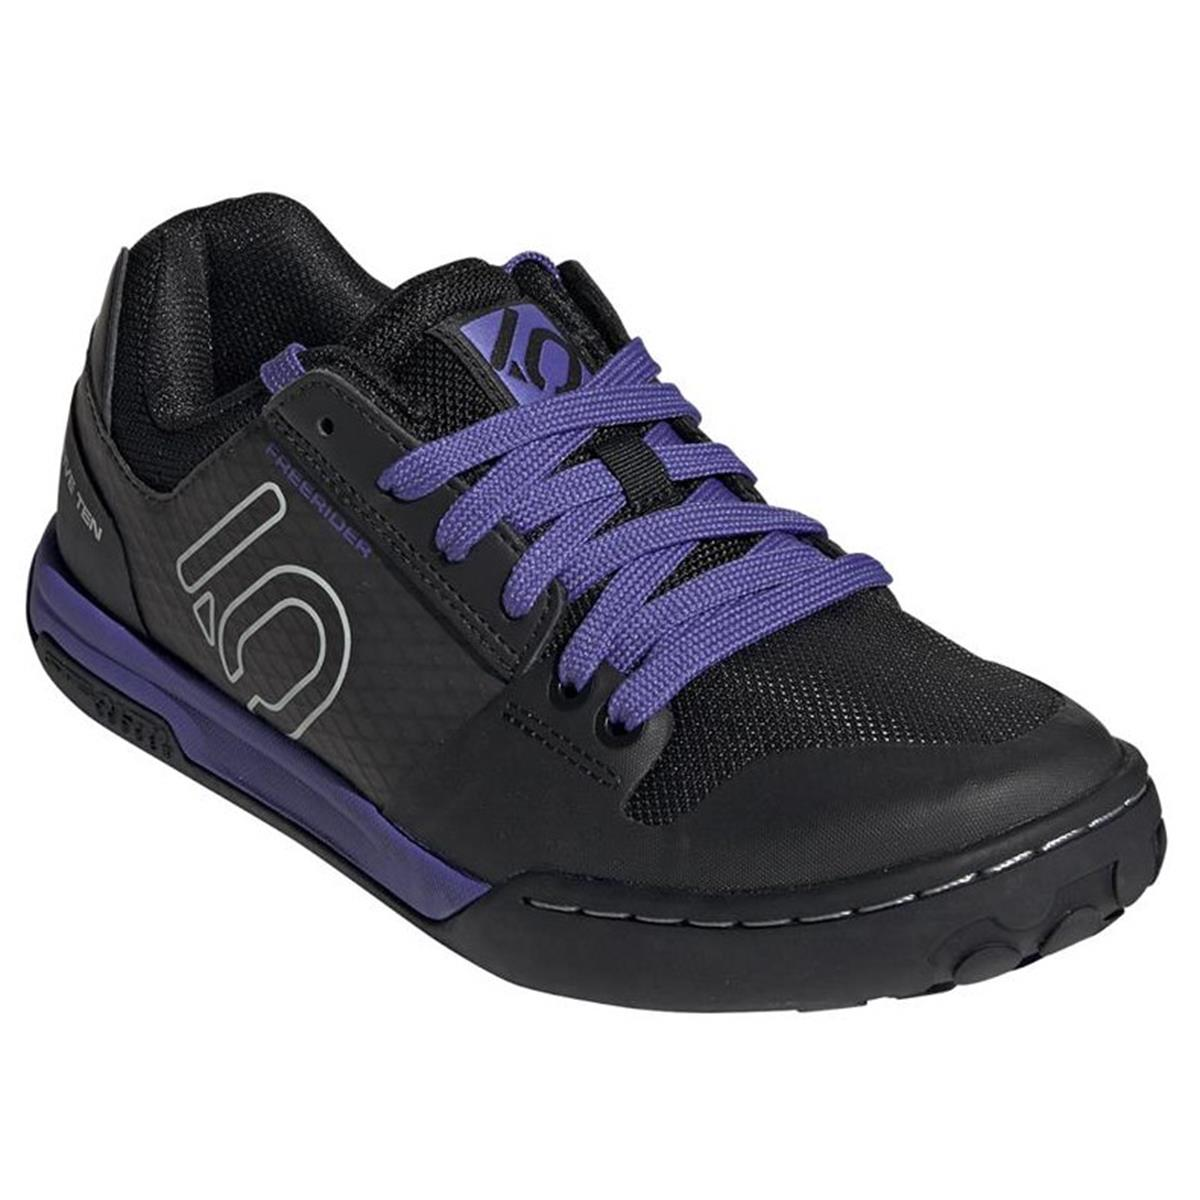 Five Ten Girls MTB-Schuhe Freerider Contact Core Black/Carbon/Purple